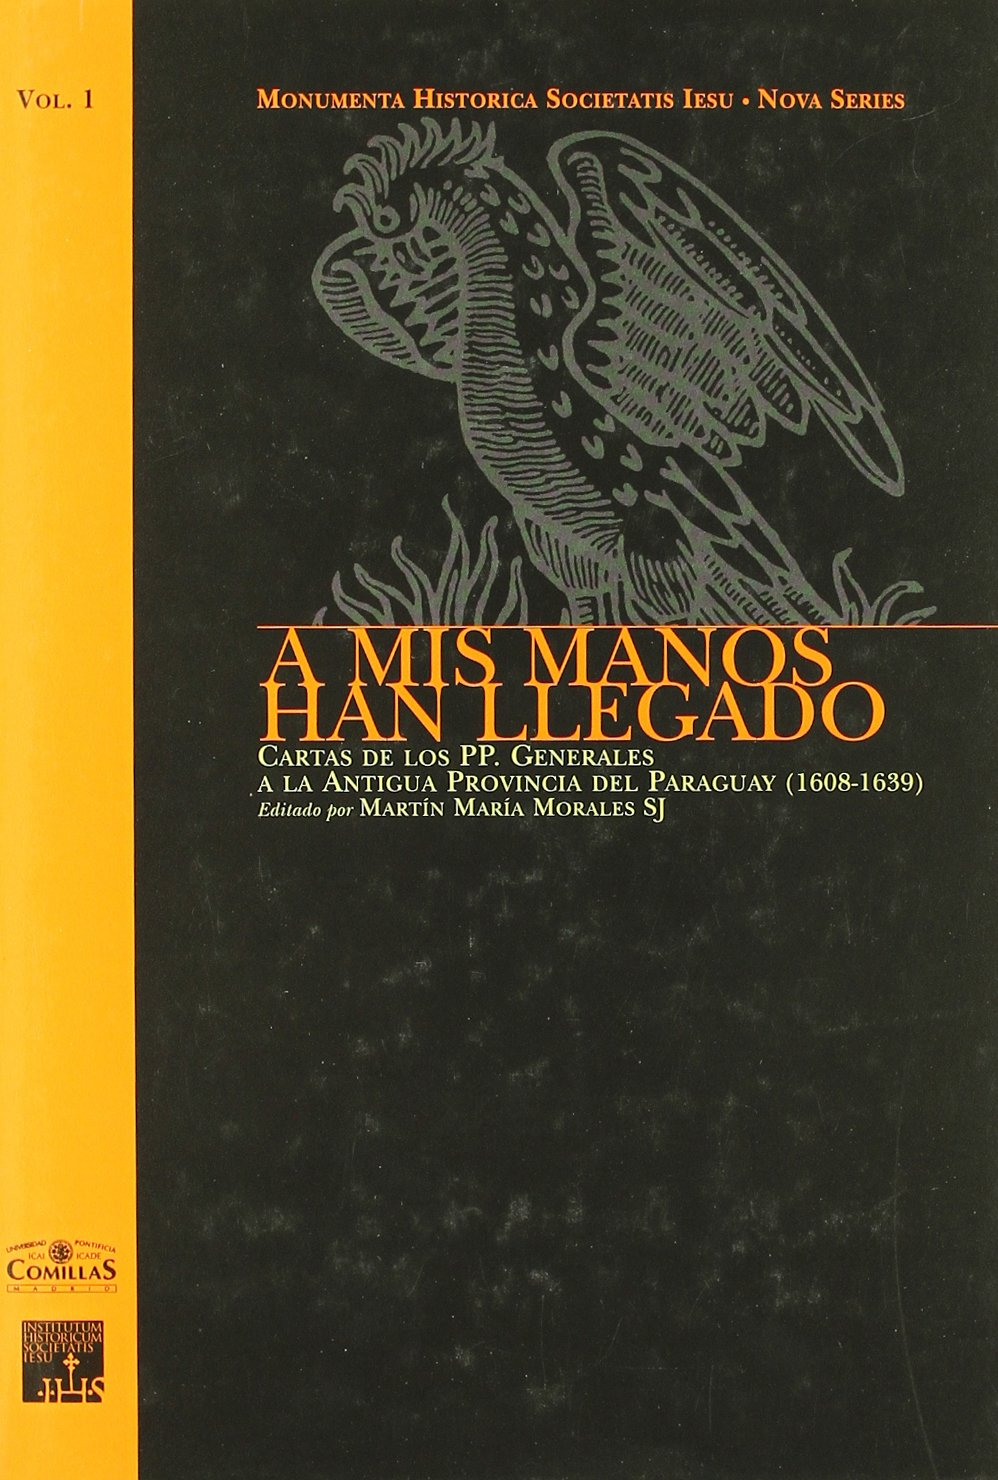 A mis manos han llegado / To My Hands They Have Arrived: Cartas de los PP. Generales a la Antigua Provincia del Paraguay, 1608-1639 / Letters of the ... of Paraguay, 1608-1639 (Spanish Edition) pdf epub